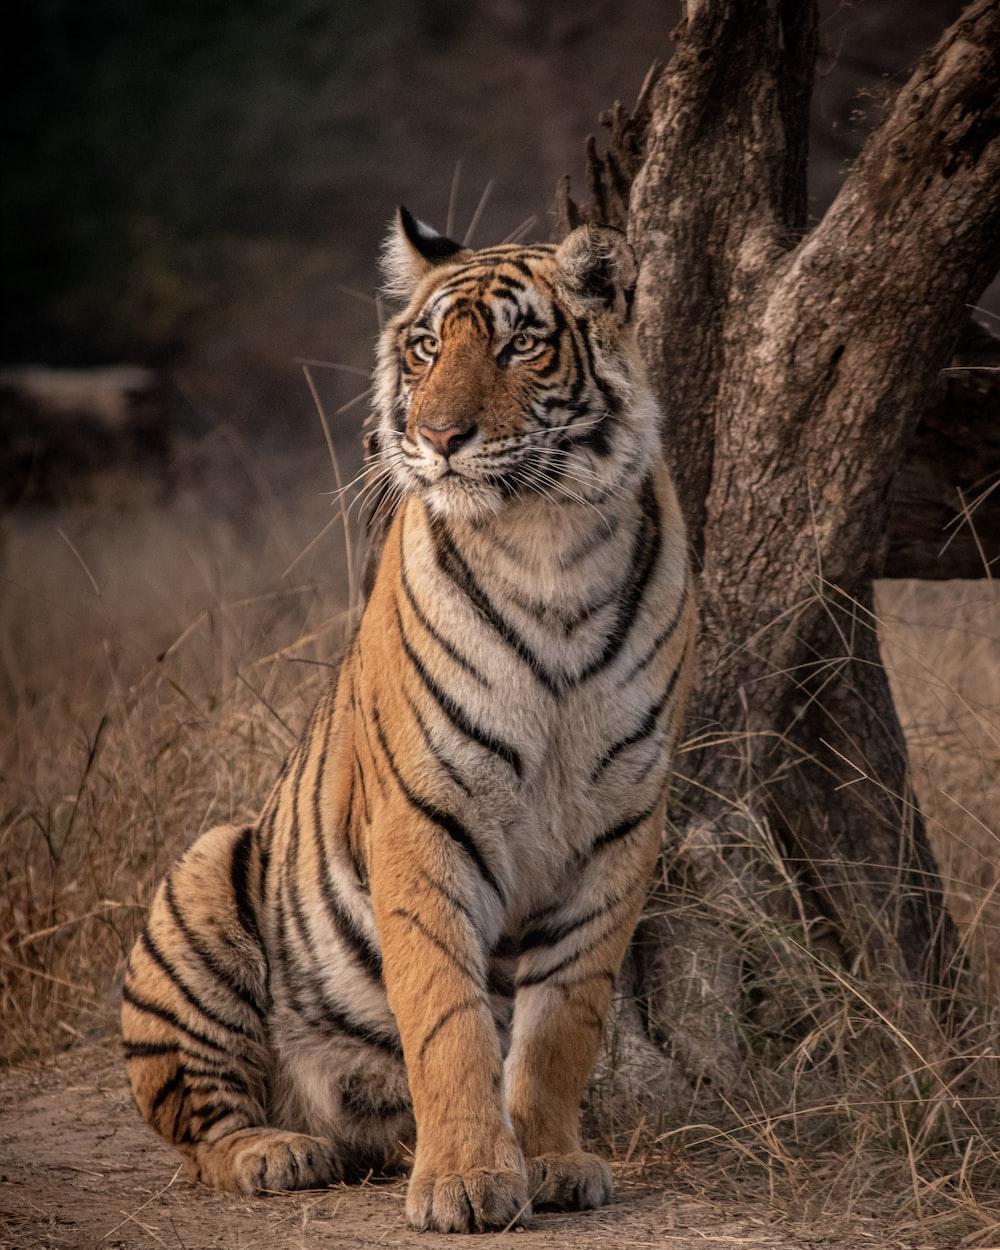 tiger on brown grass during daytime